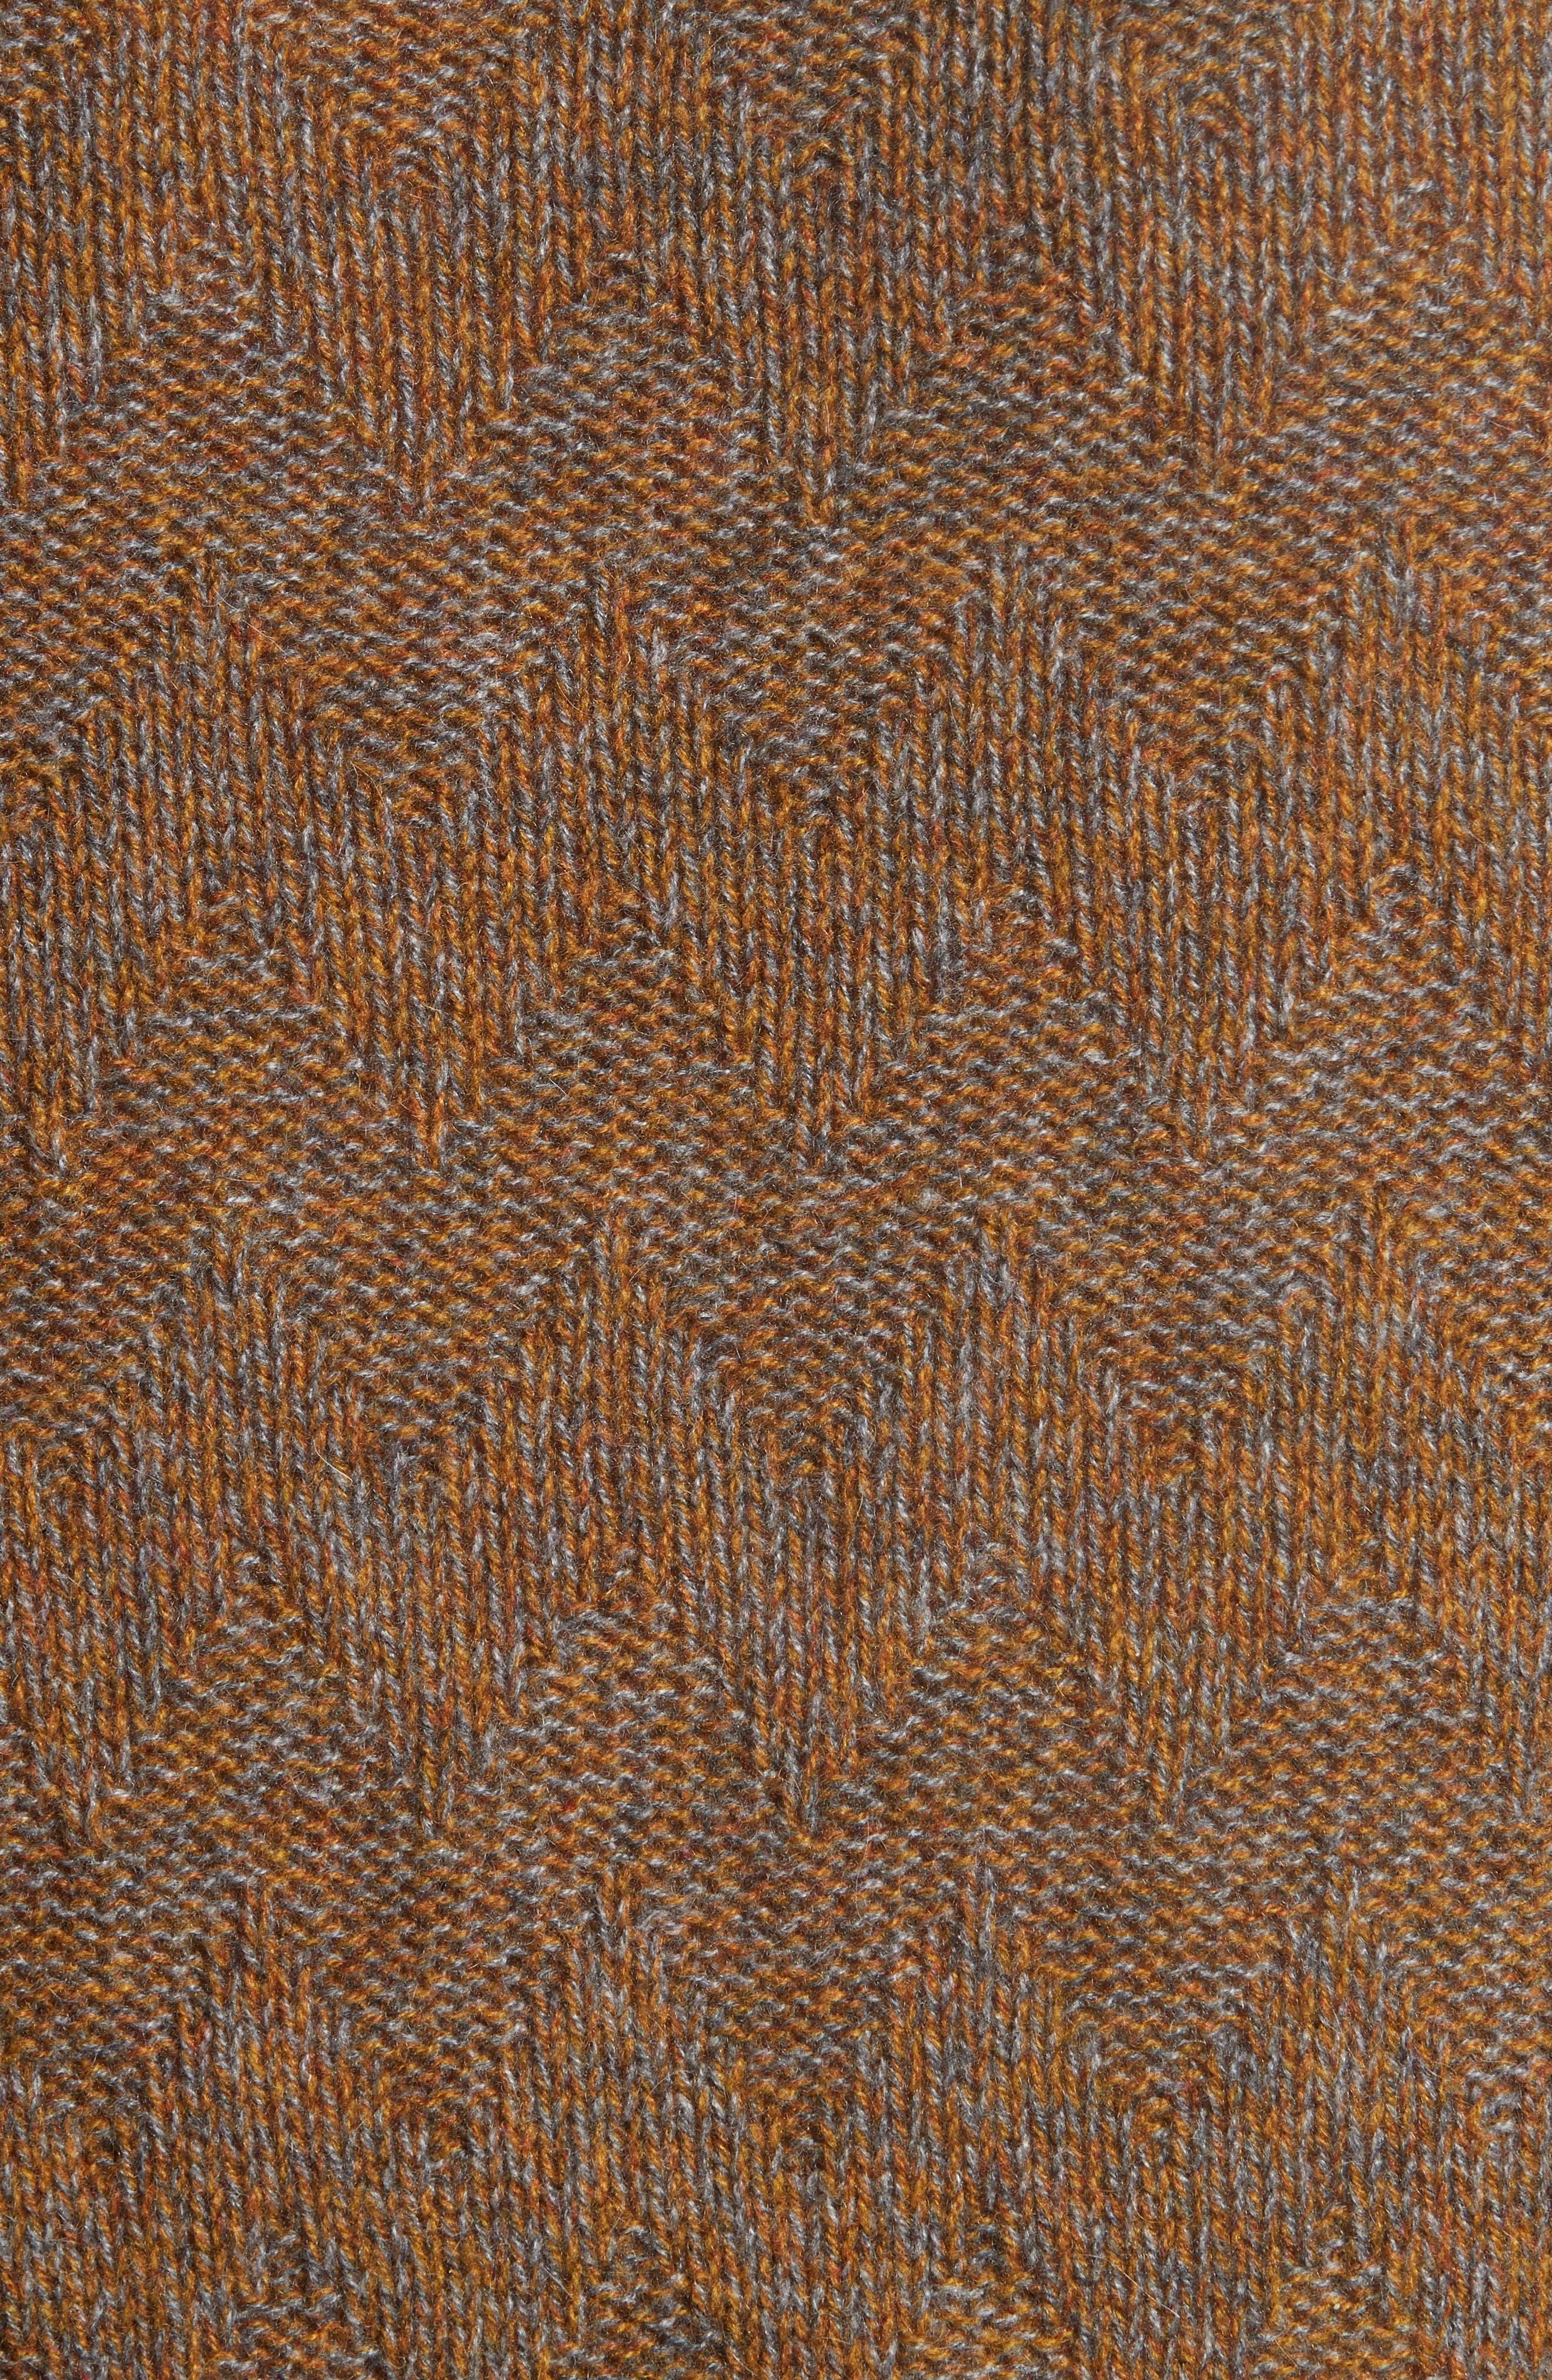 Chevron Knit Cashmere Sweater,                             Alternate thumbnail 6, color,                             Brown